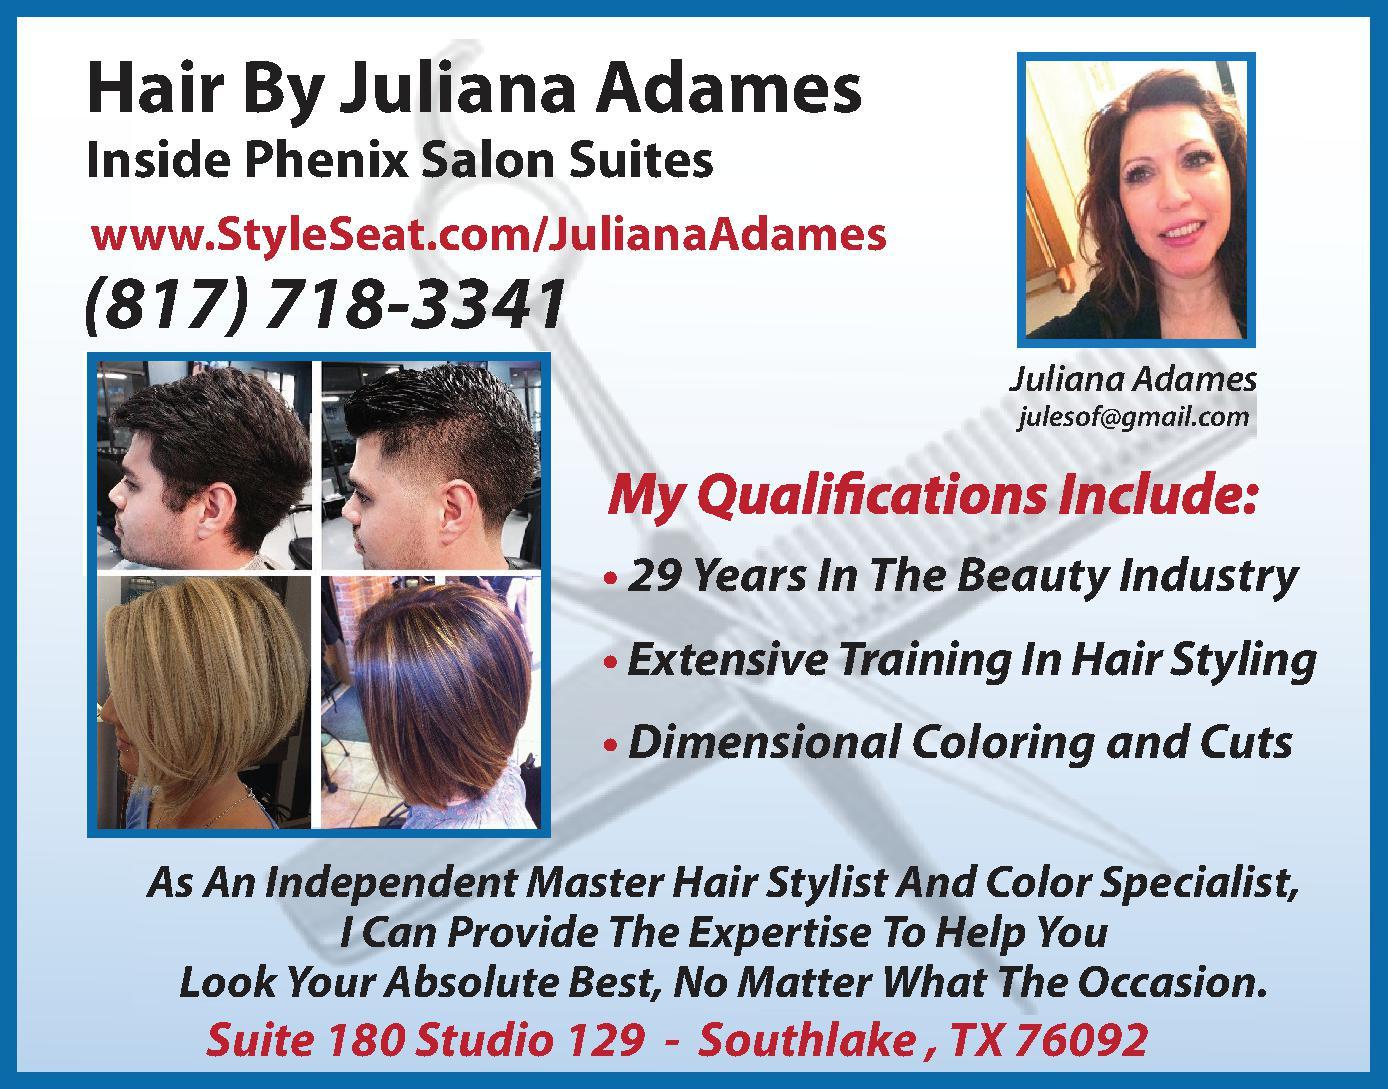 Hair By Juliana Adames